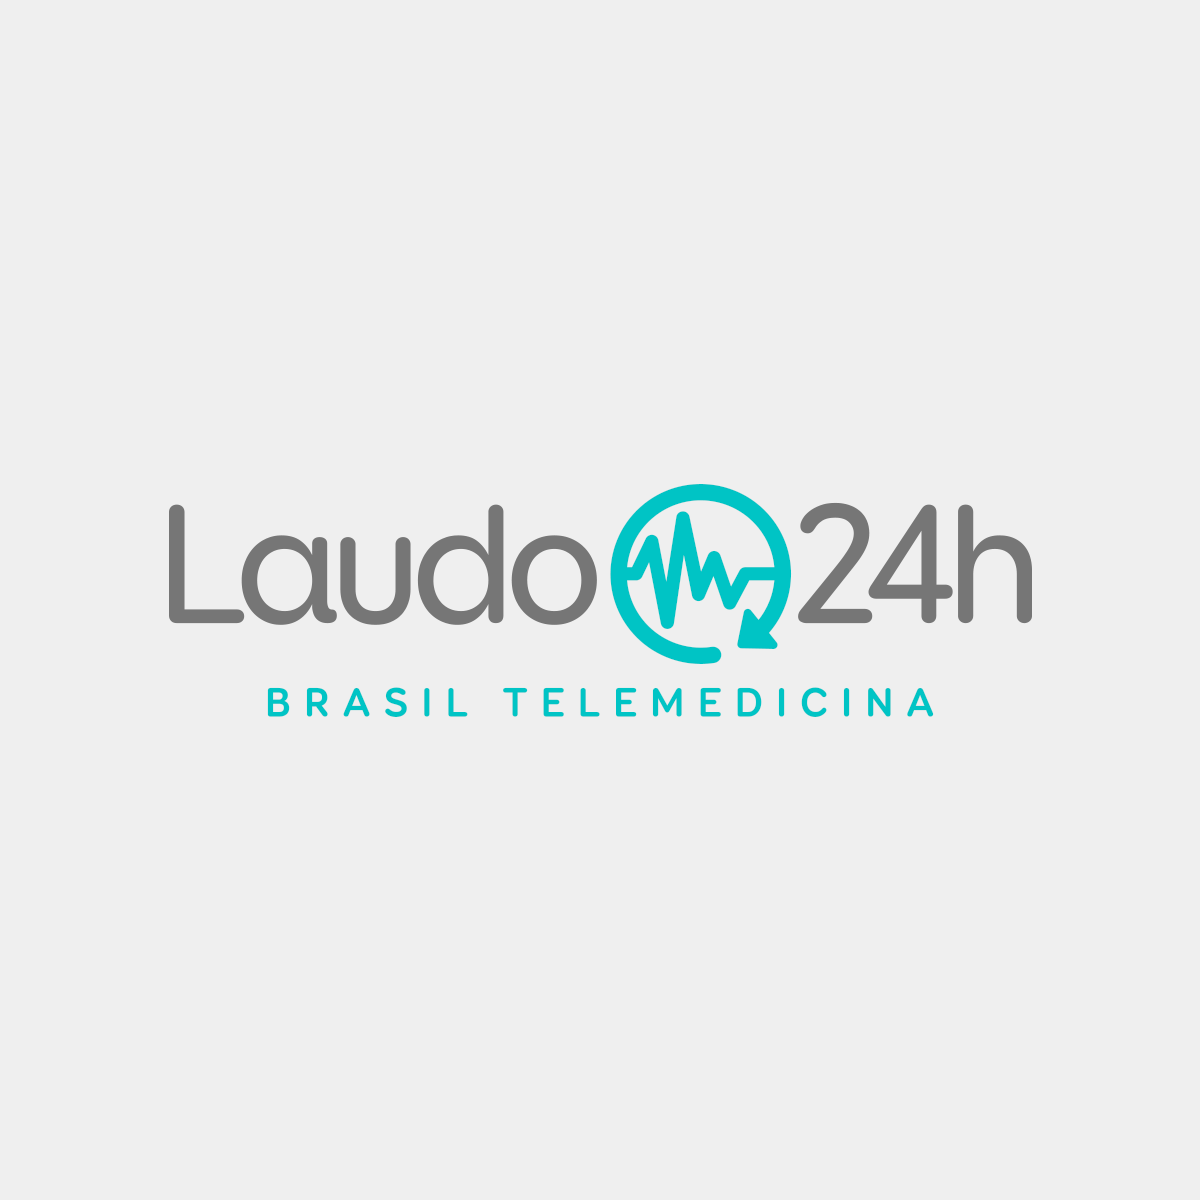 https://brasiltelemedicina.com.br/wp-content/uploads/2016/07/laudo-24hs-1200x1200.png